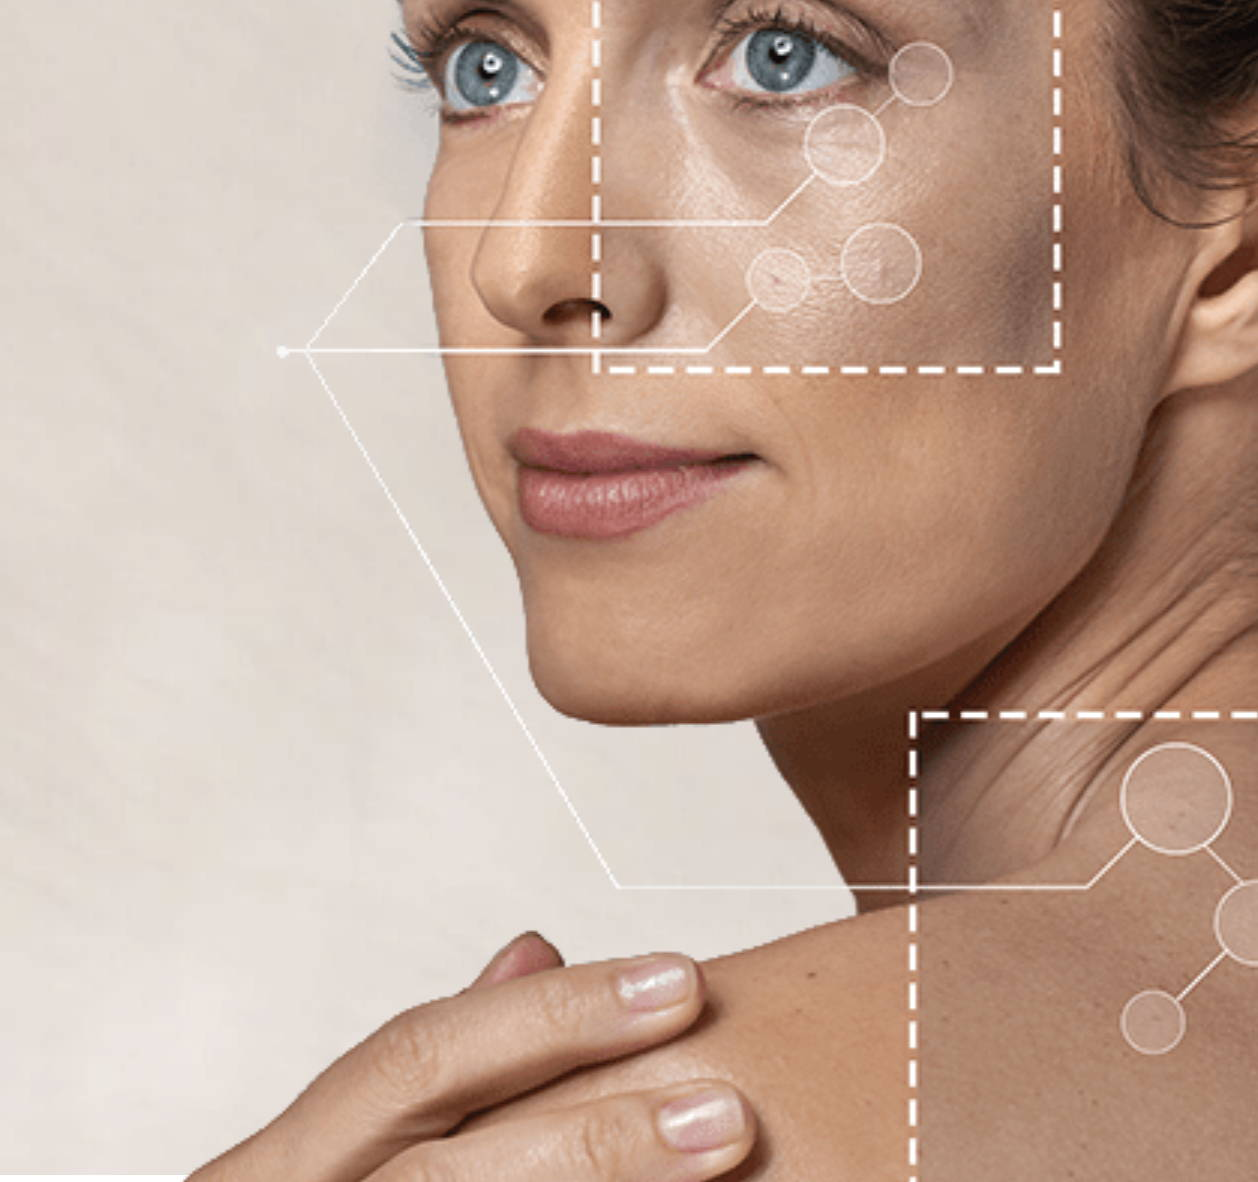 vivace micro needling beautymedix brighton medical spa Melbourne skin ageing solutions medispa vivace rf micro needling